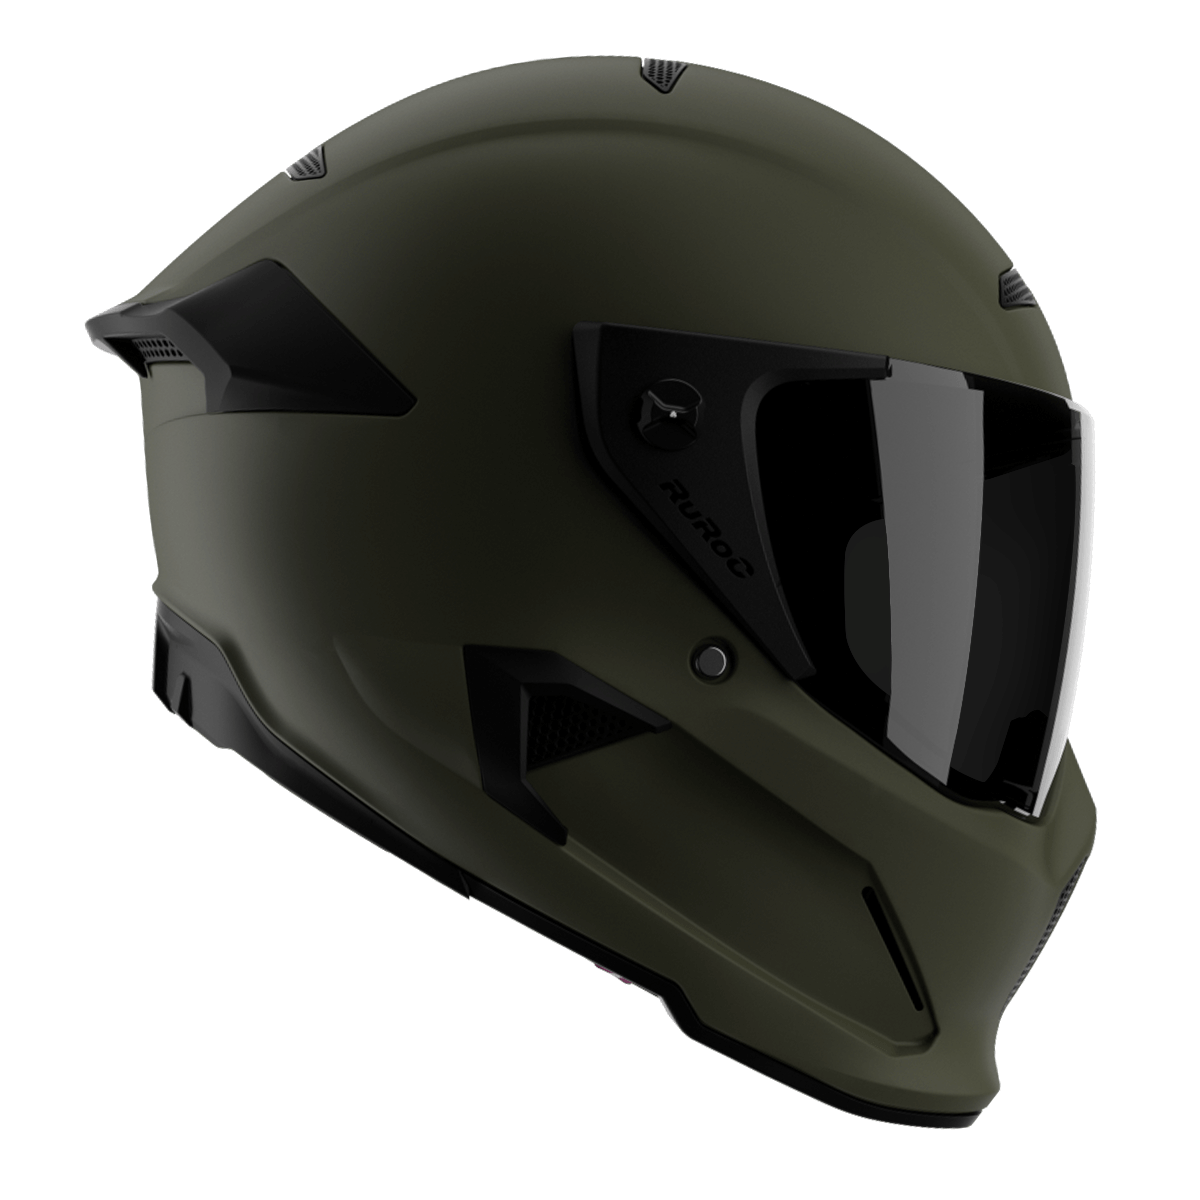 Atlas 2 0 Helmet Camo Helmet Camo Full Face Motorcycle Helmets